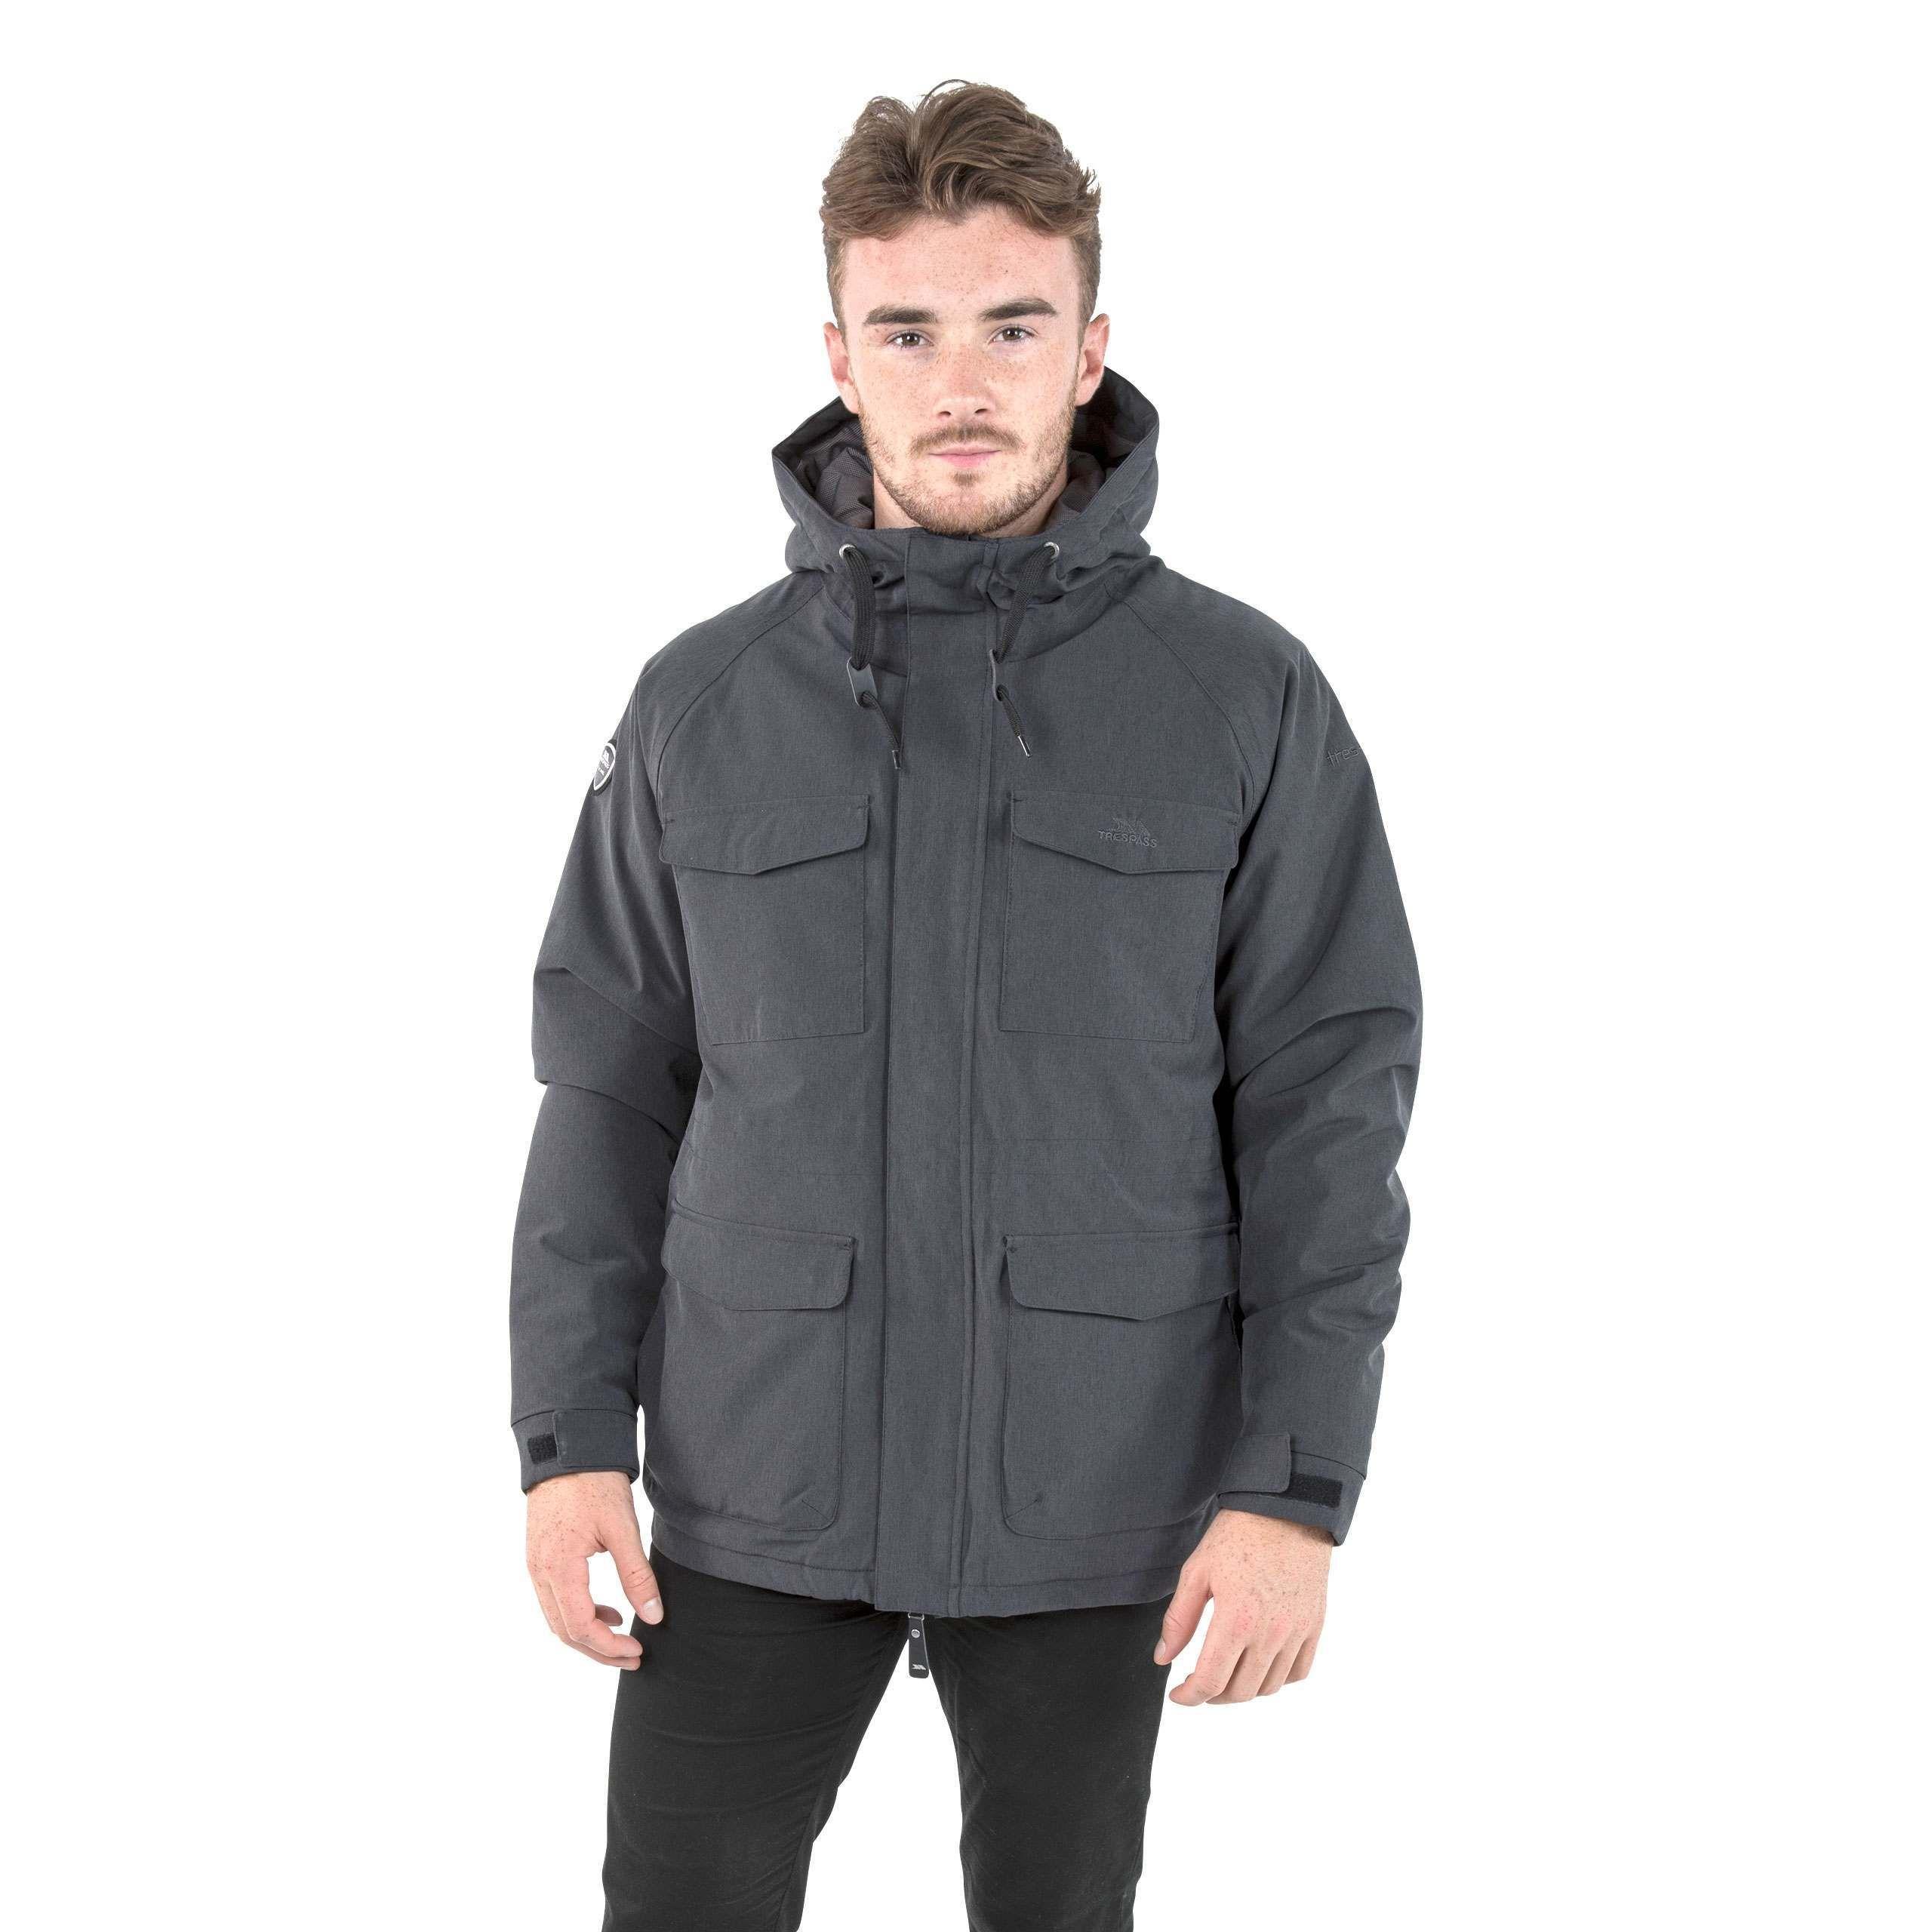 Saunter Mens Padded Fleece Jacket